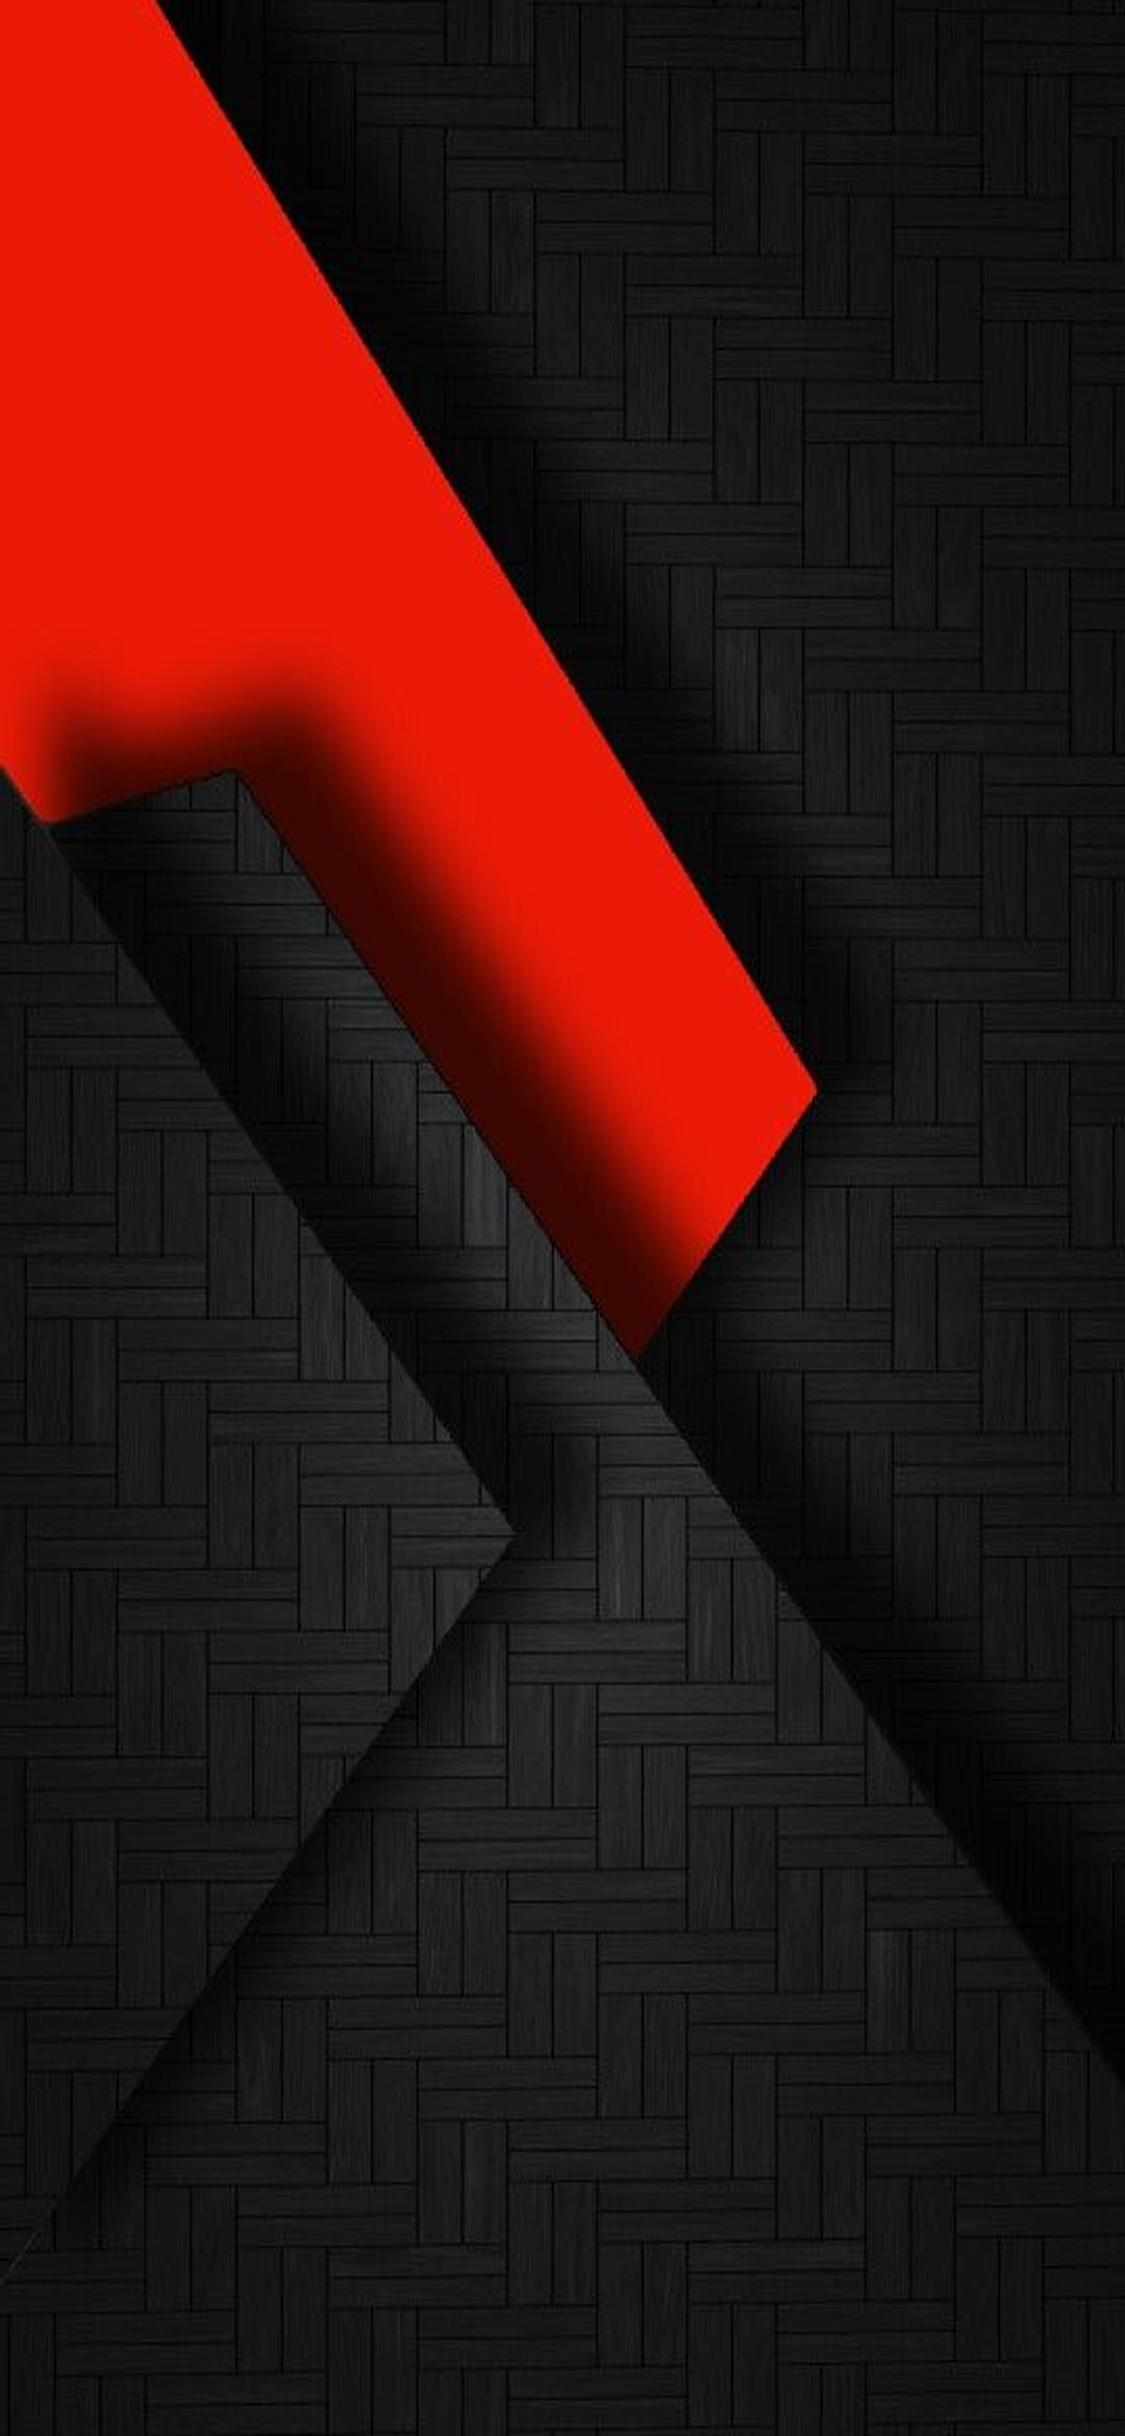 iPhone X Max Black Wallpapers - Wallpaper Cave